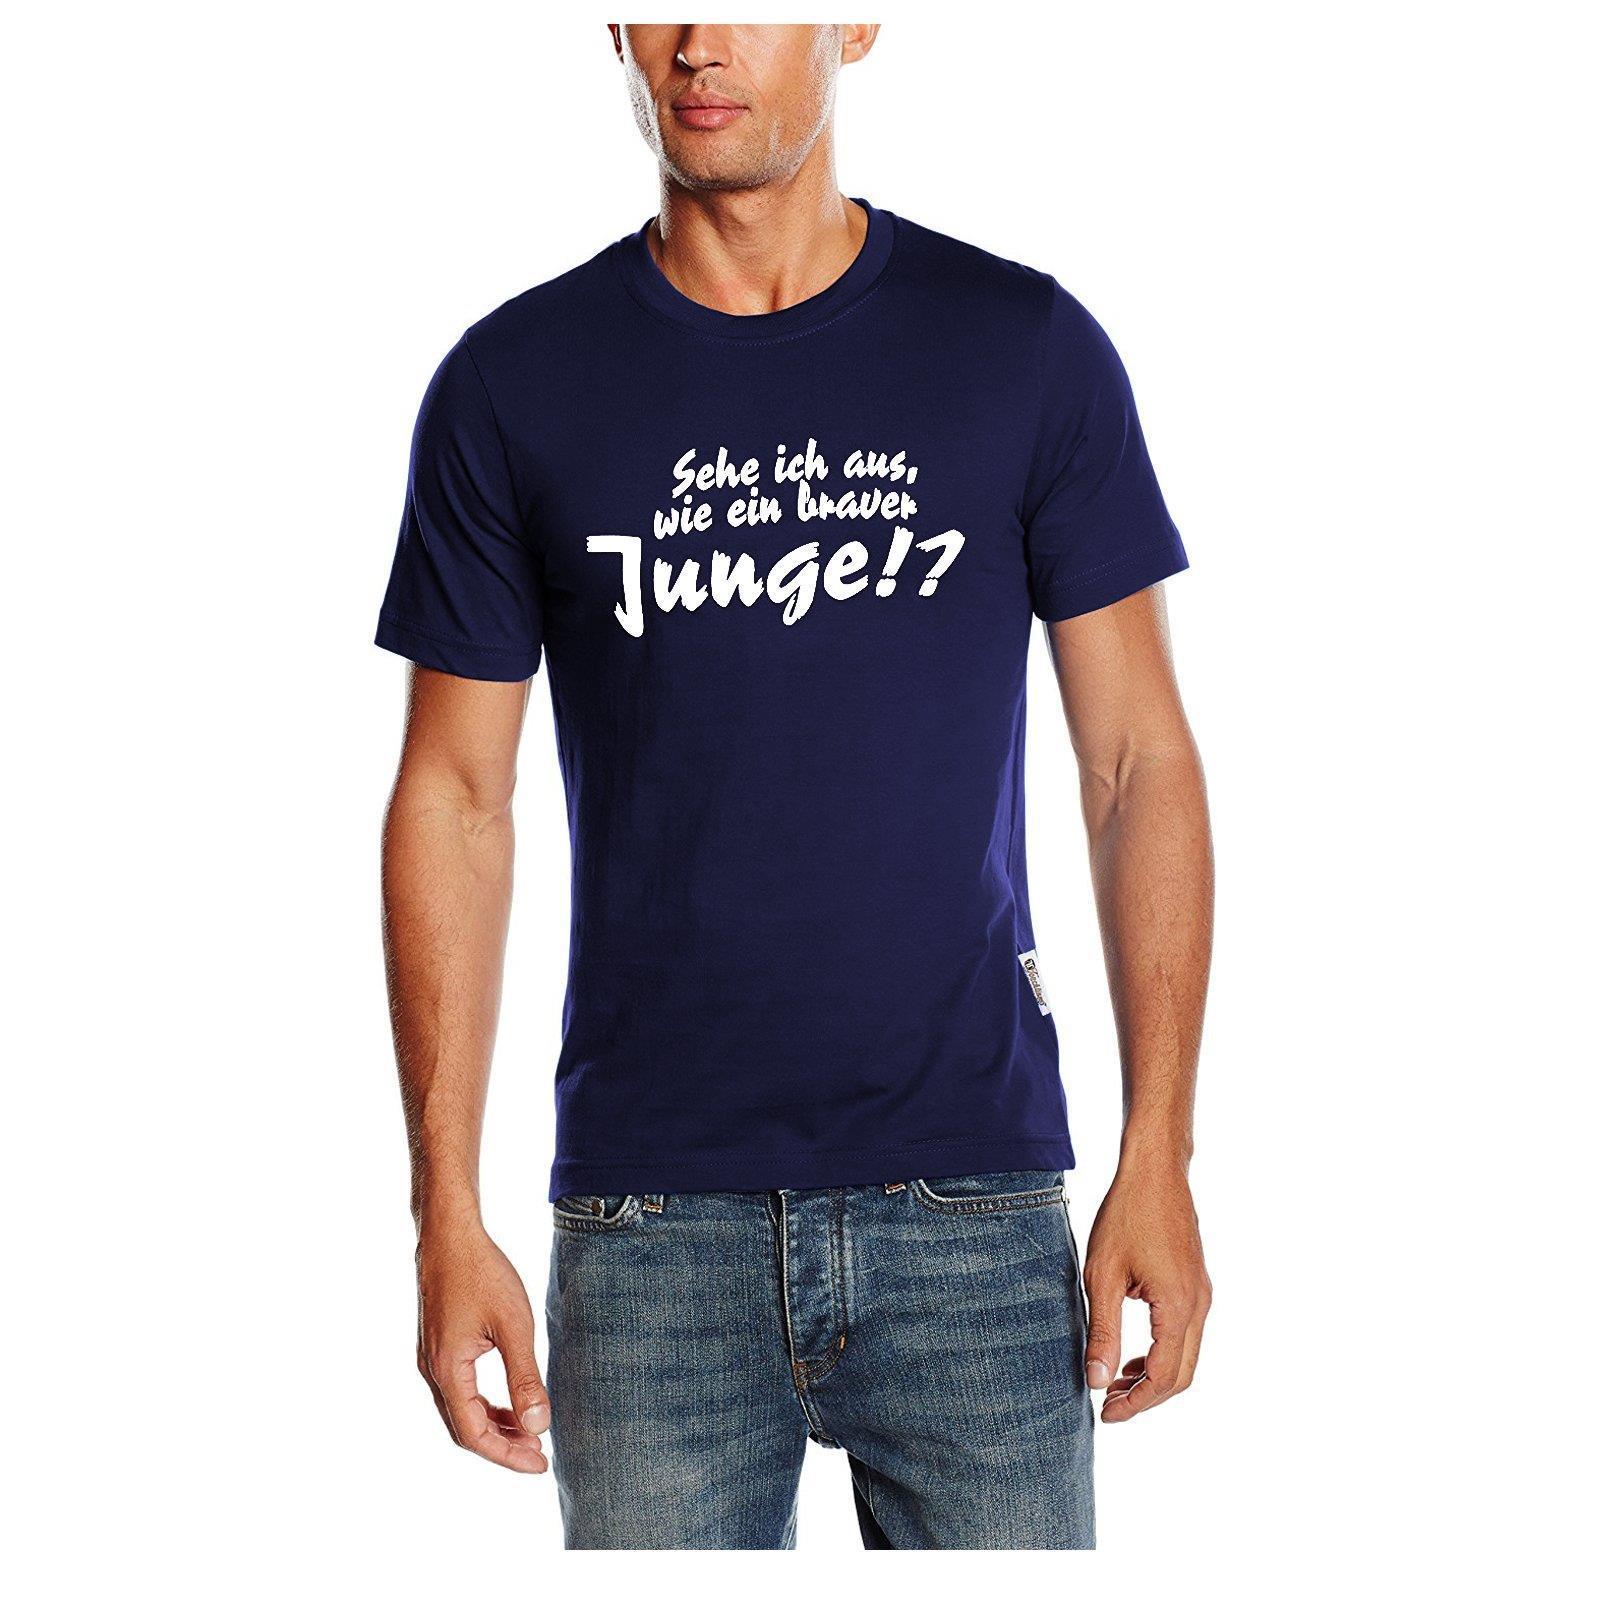 Full Size of T Shirts Lustige Sprche Fun Herren Witzig Groe Autos Sind Junggesellenabschied T Shirt Sprüche Wandtattoo Shirt Junggesellinnenabschied Coole Wandtattoos Küche Lustige T Shirt Sprüche